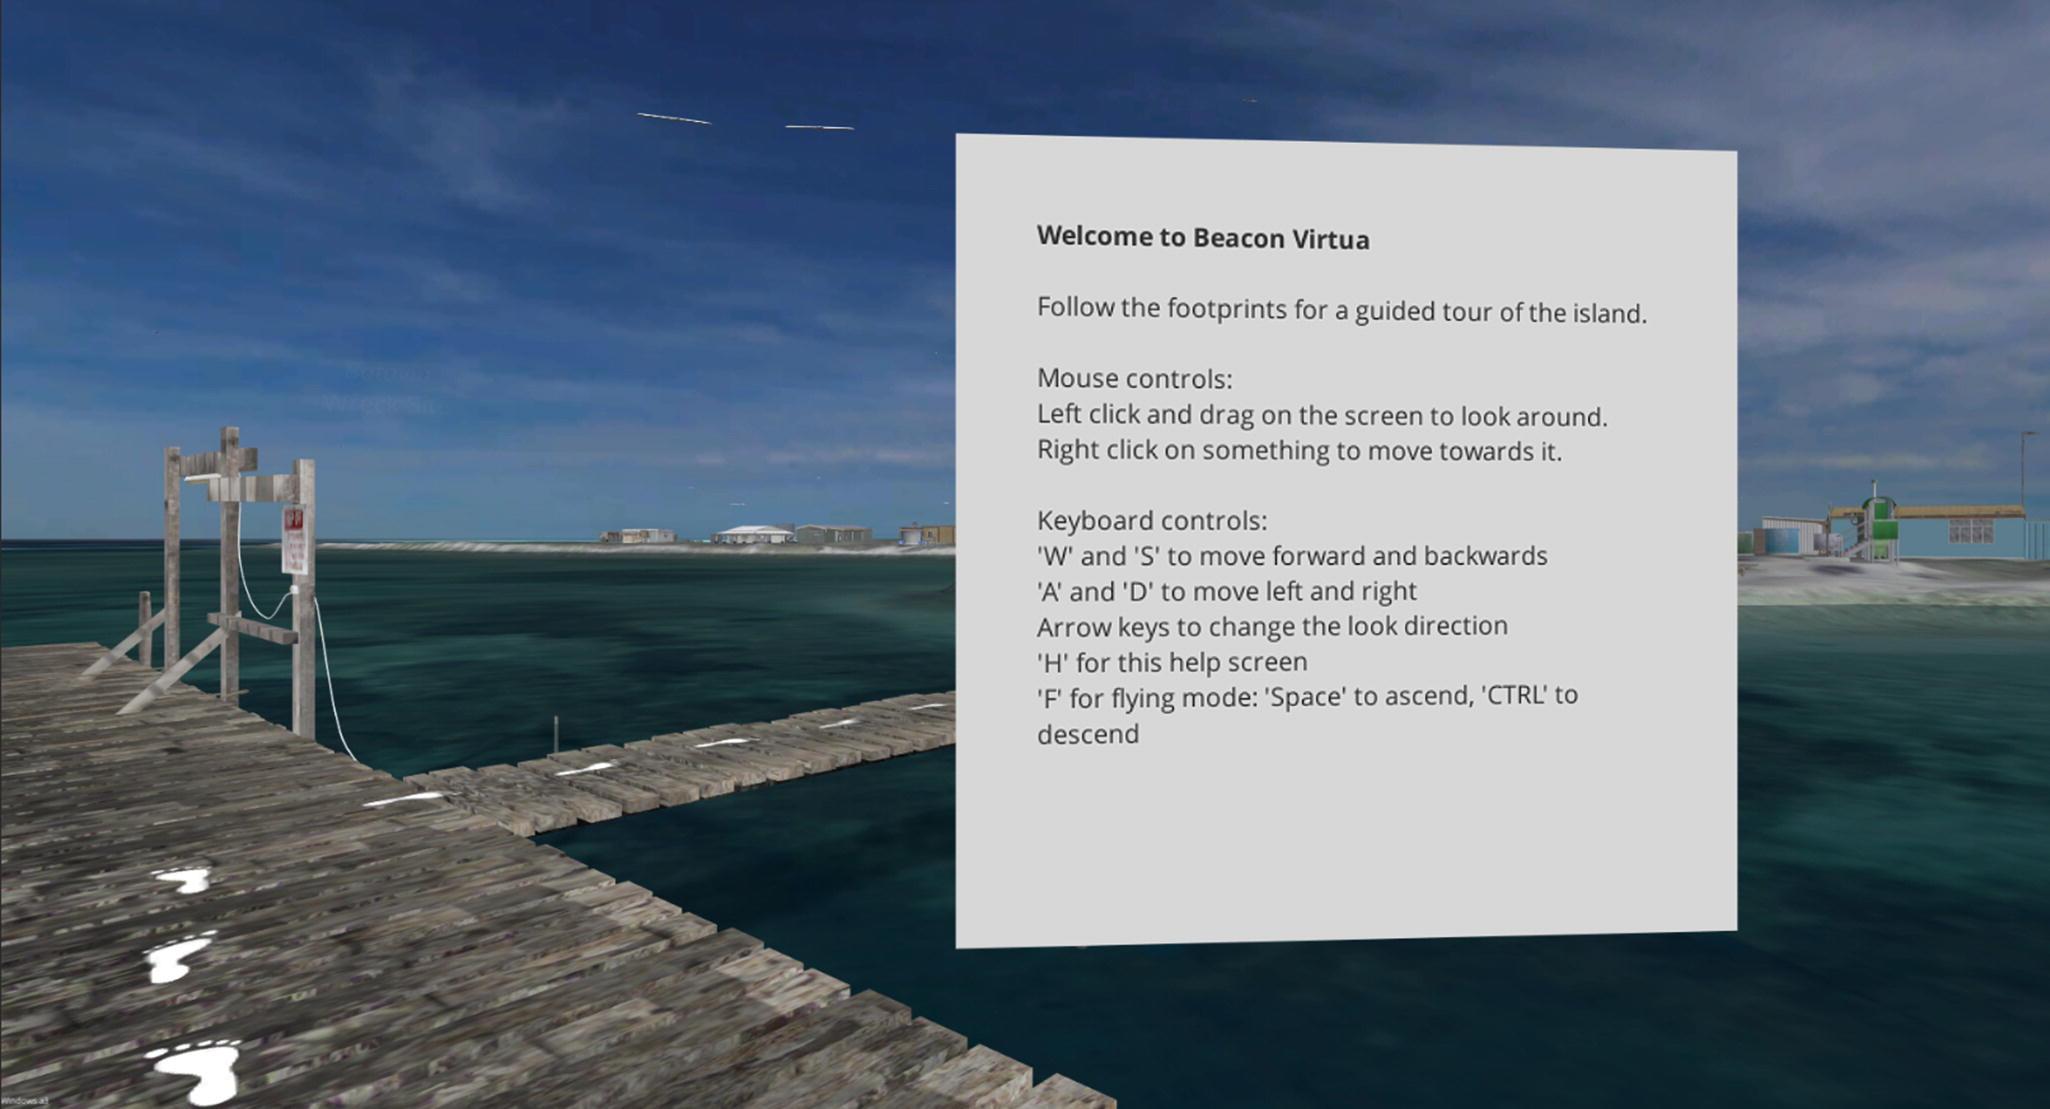 Beacon Virtua: A Virtual Reality Simulation Detailing the